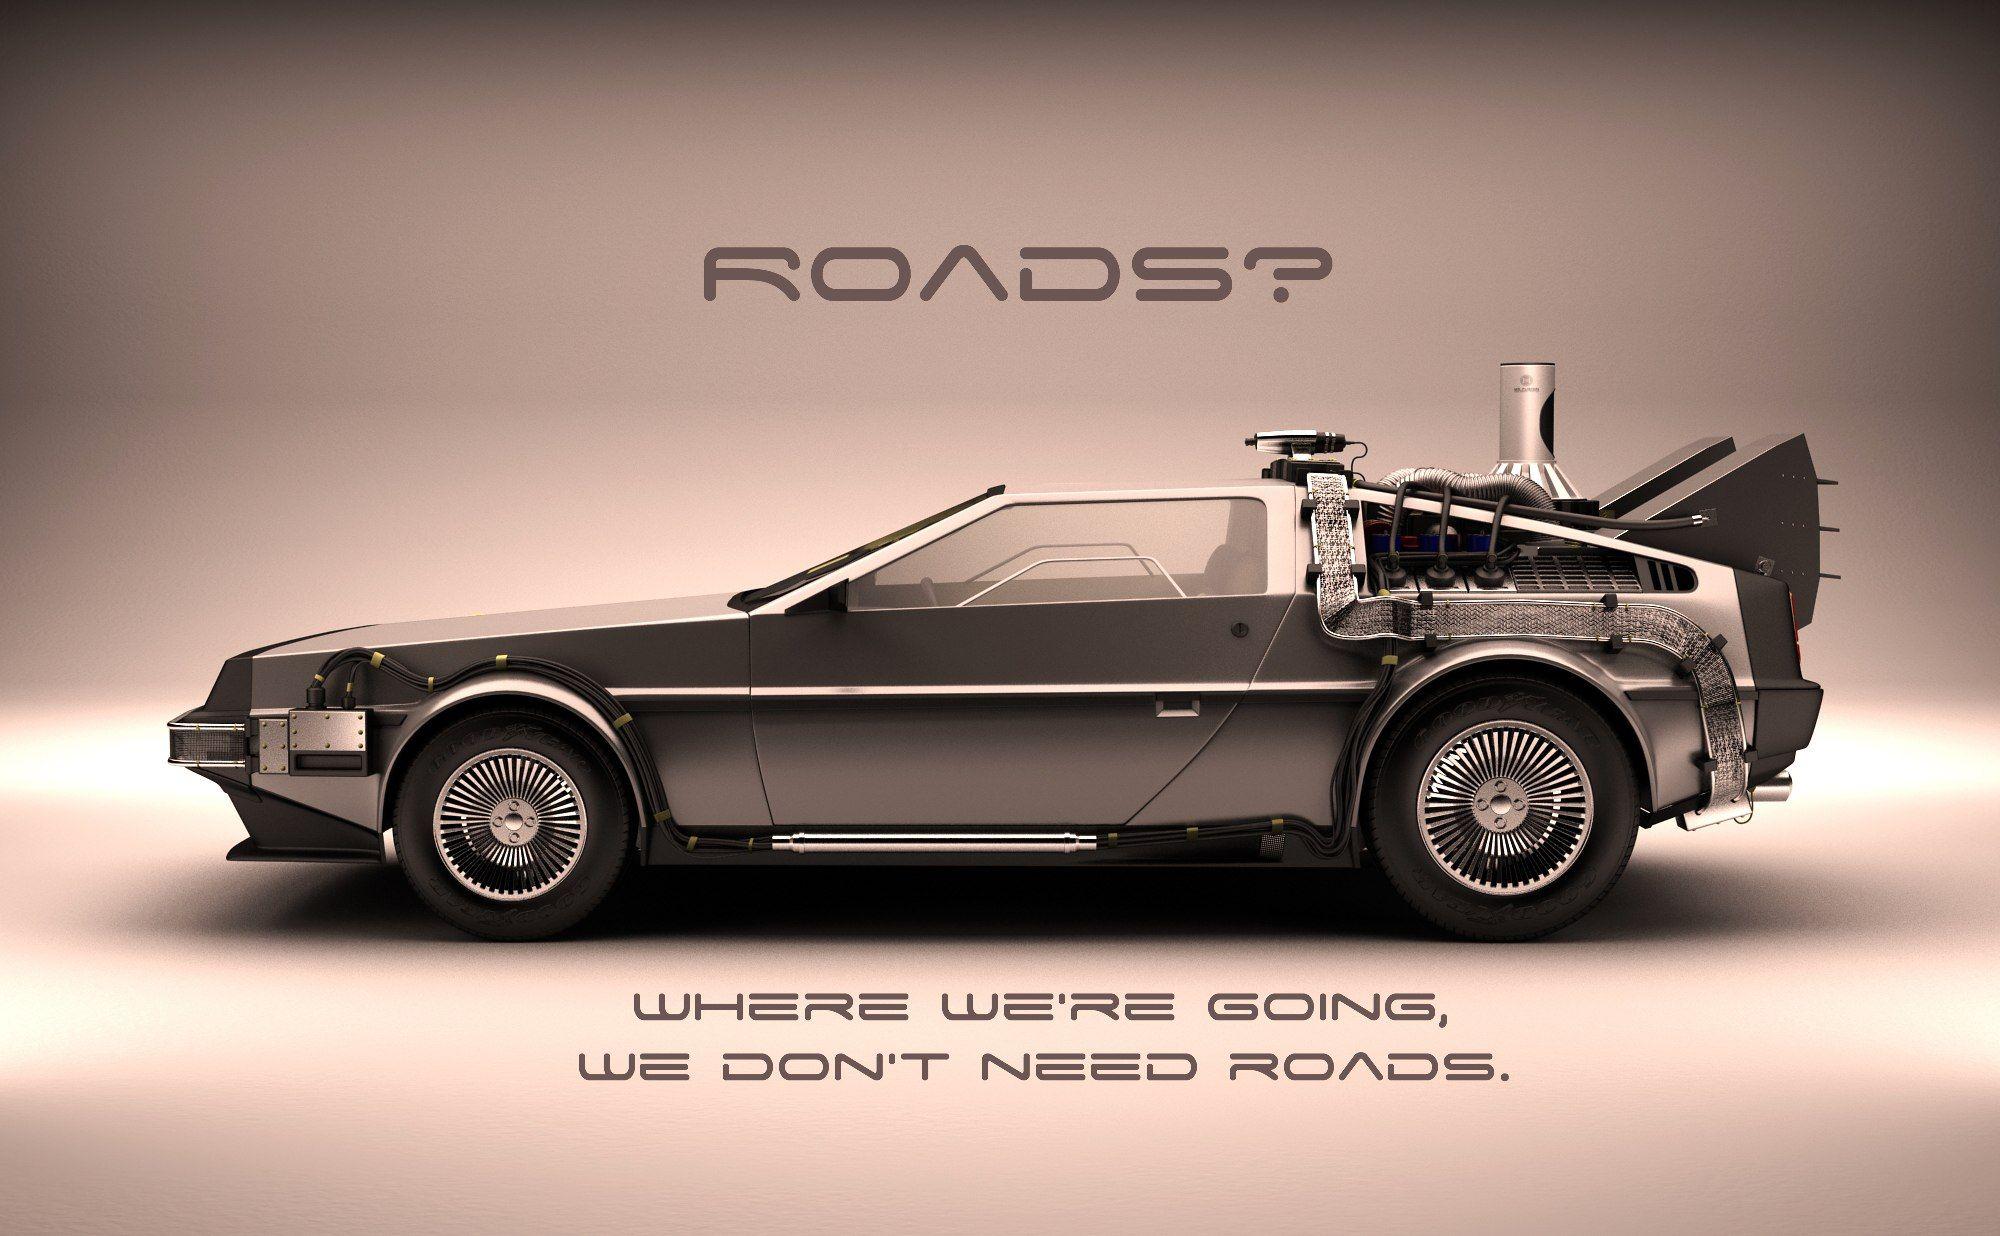 DeLorean DMC-12 Poster Print Back To The Future Car Collector Doc Brown